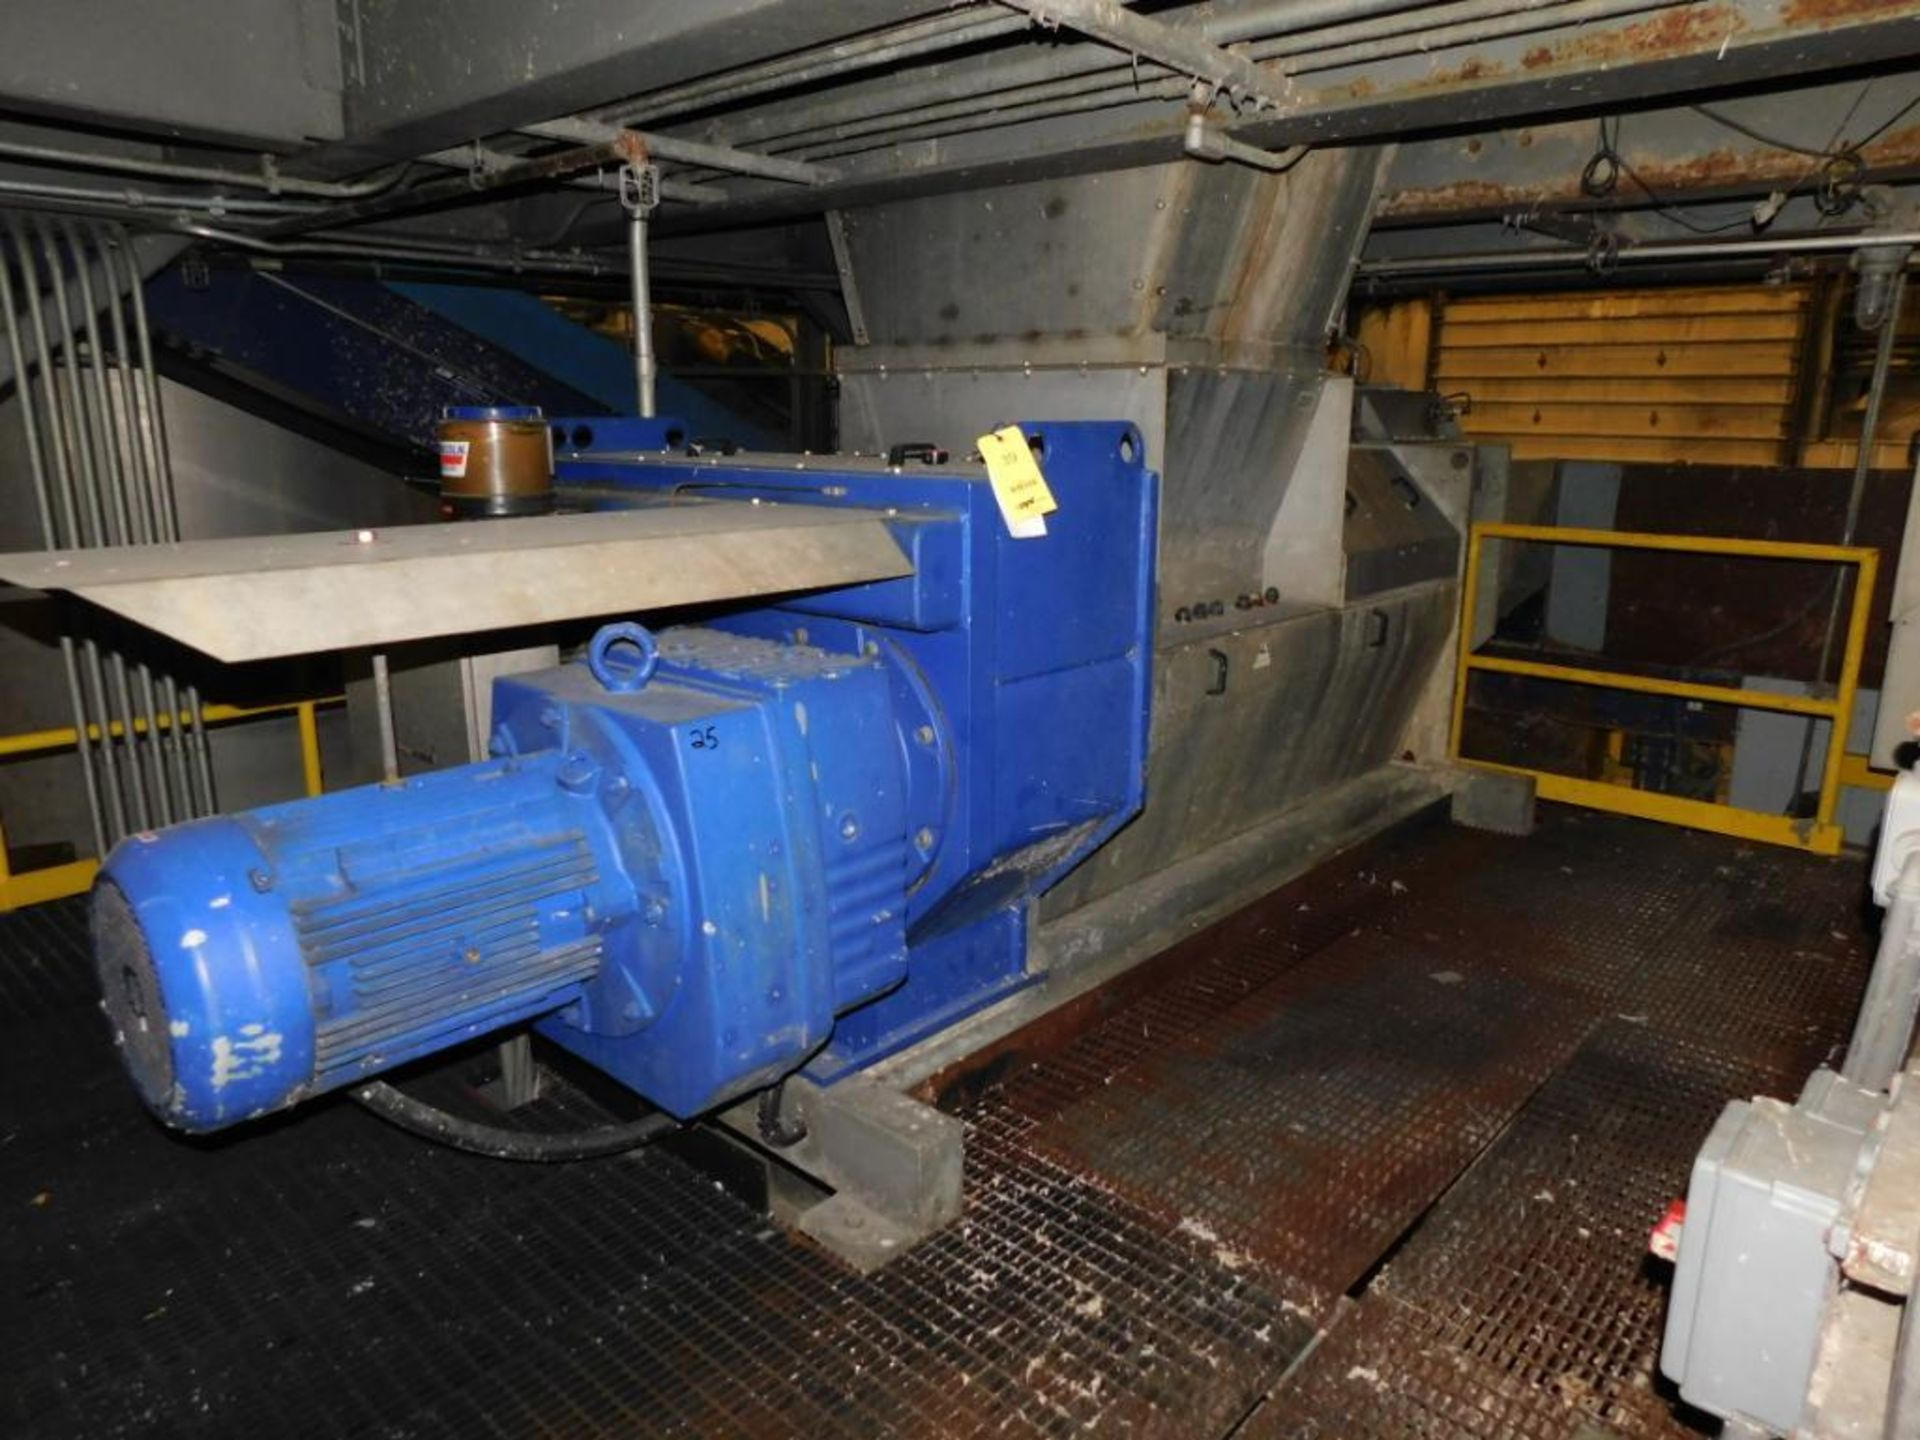 Lot 39 - Trumag/Meri Compax Screw Press Model CFX60R, S/N 11142 (2009), Driven by 30kw Motor (#EC-774-02-025,